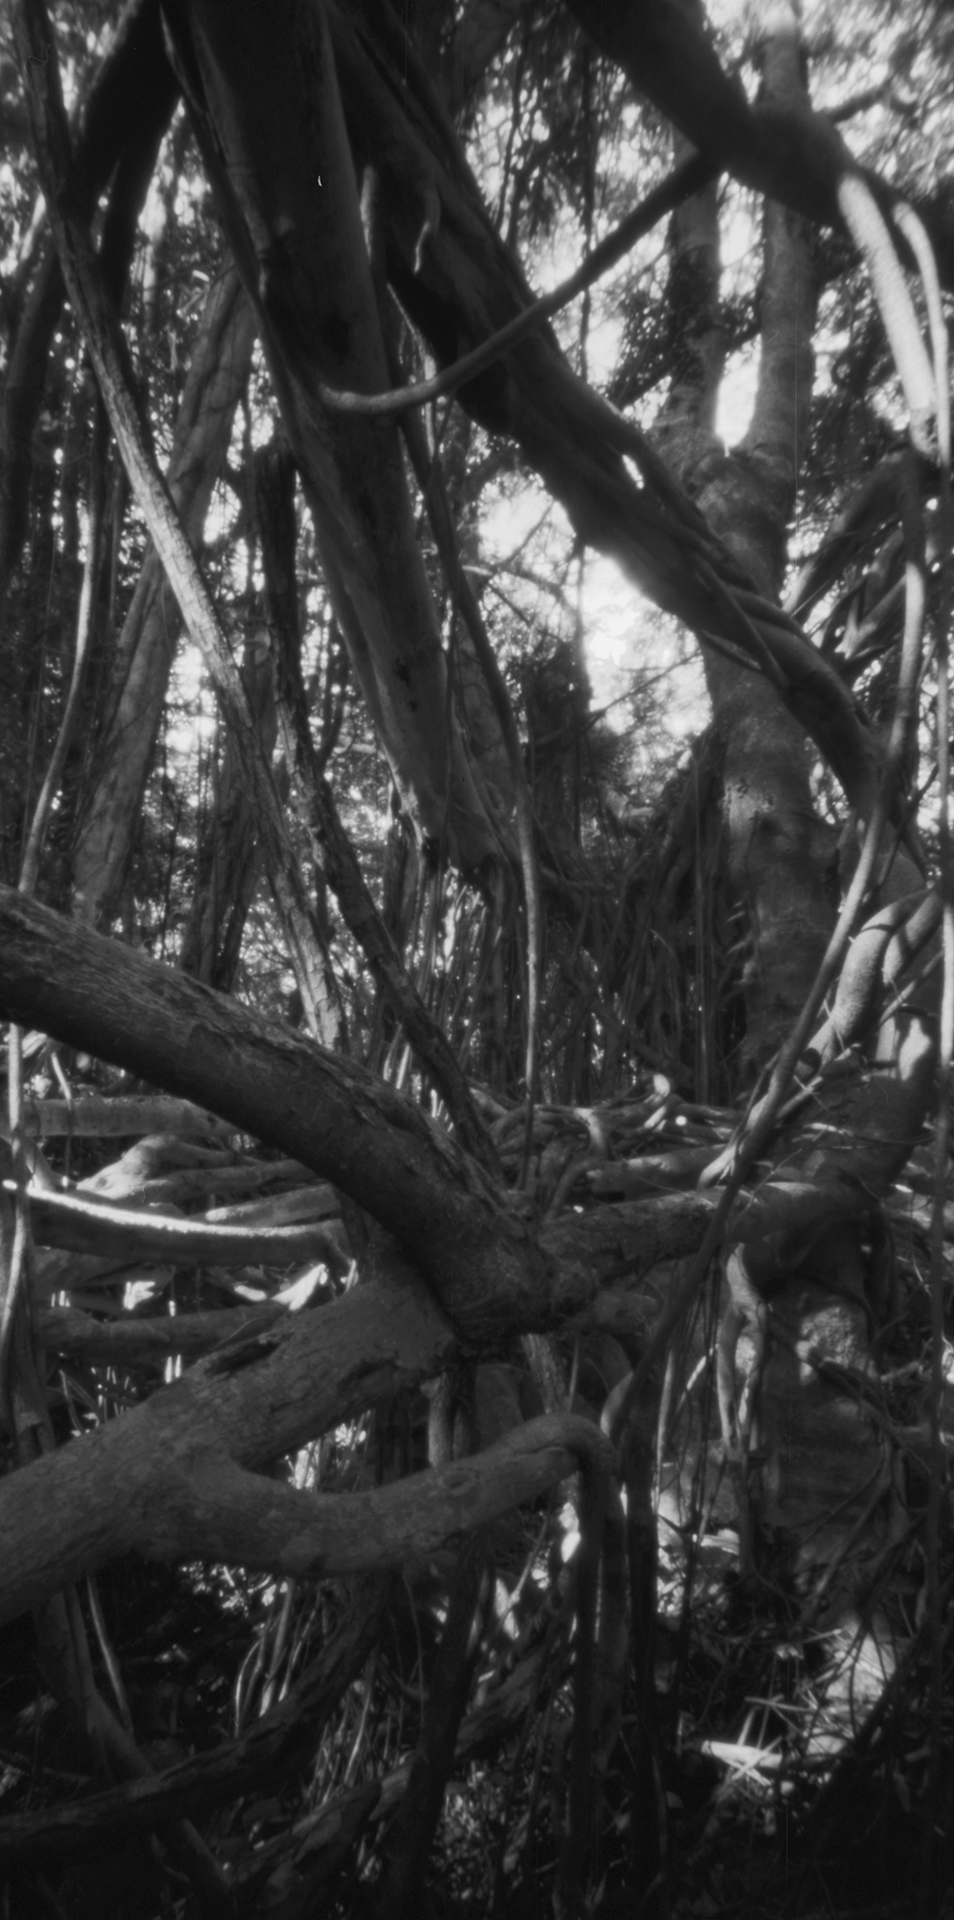 Banyan tree. Japan, Iriomoto, 2015